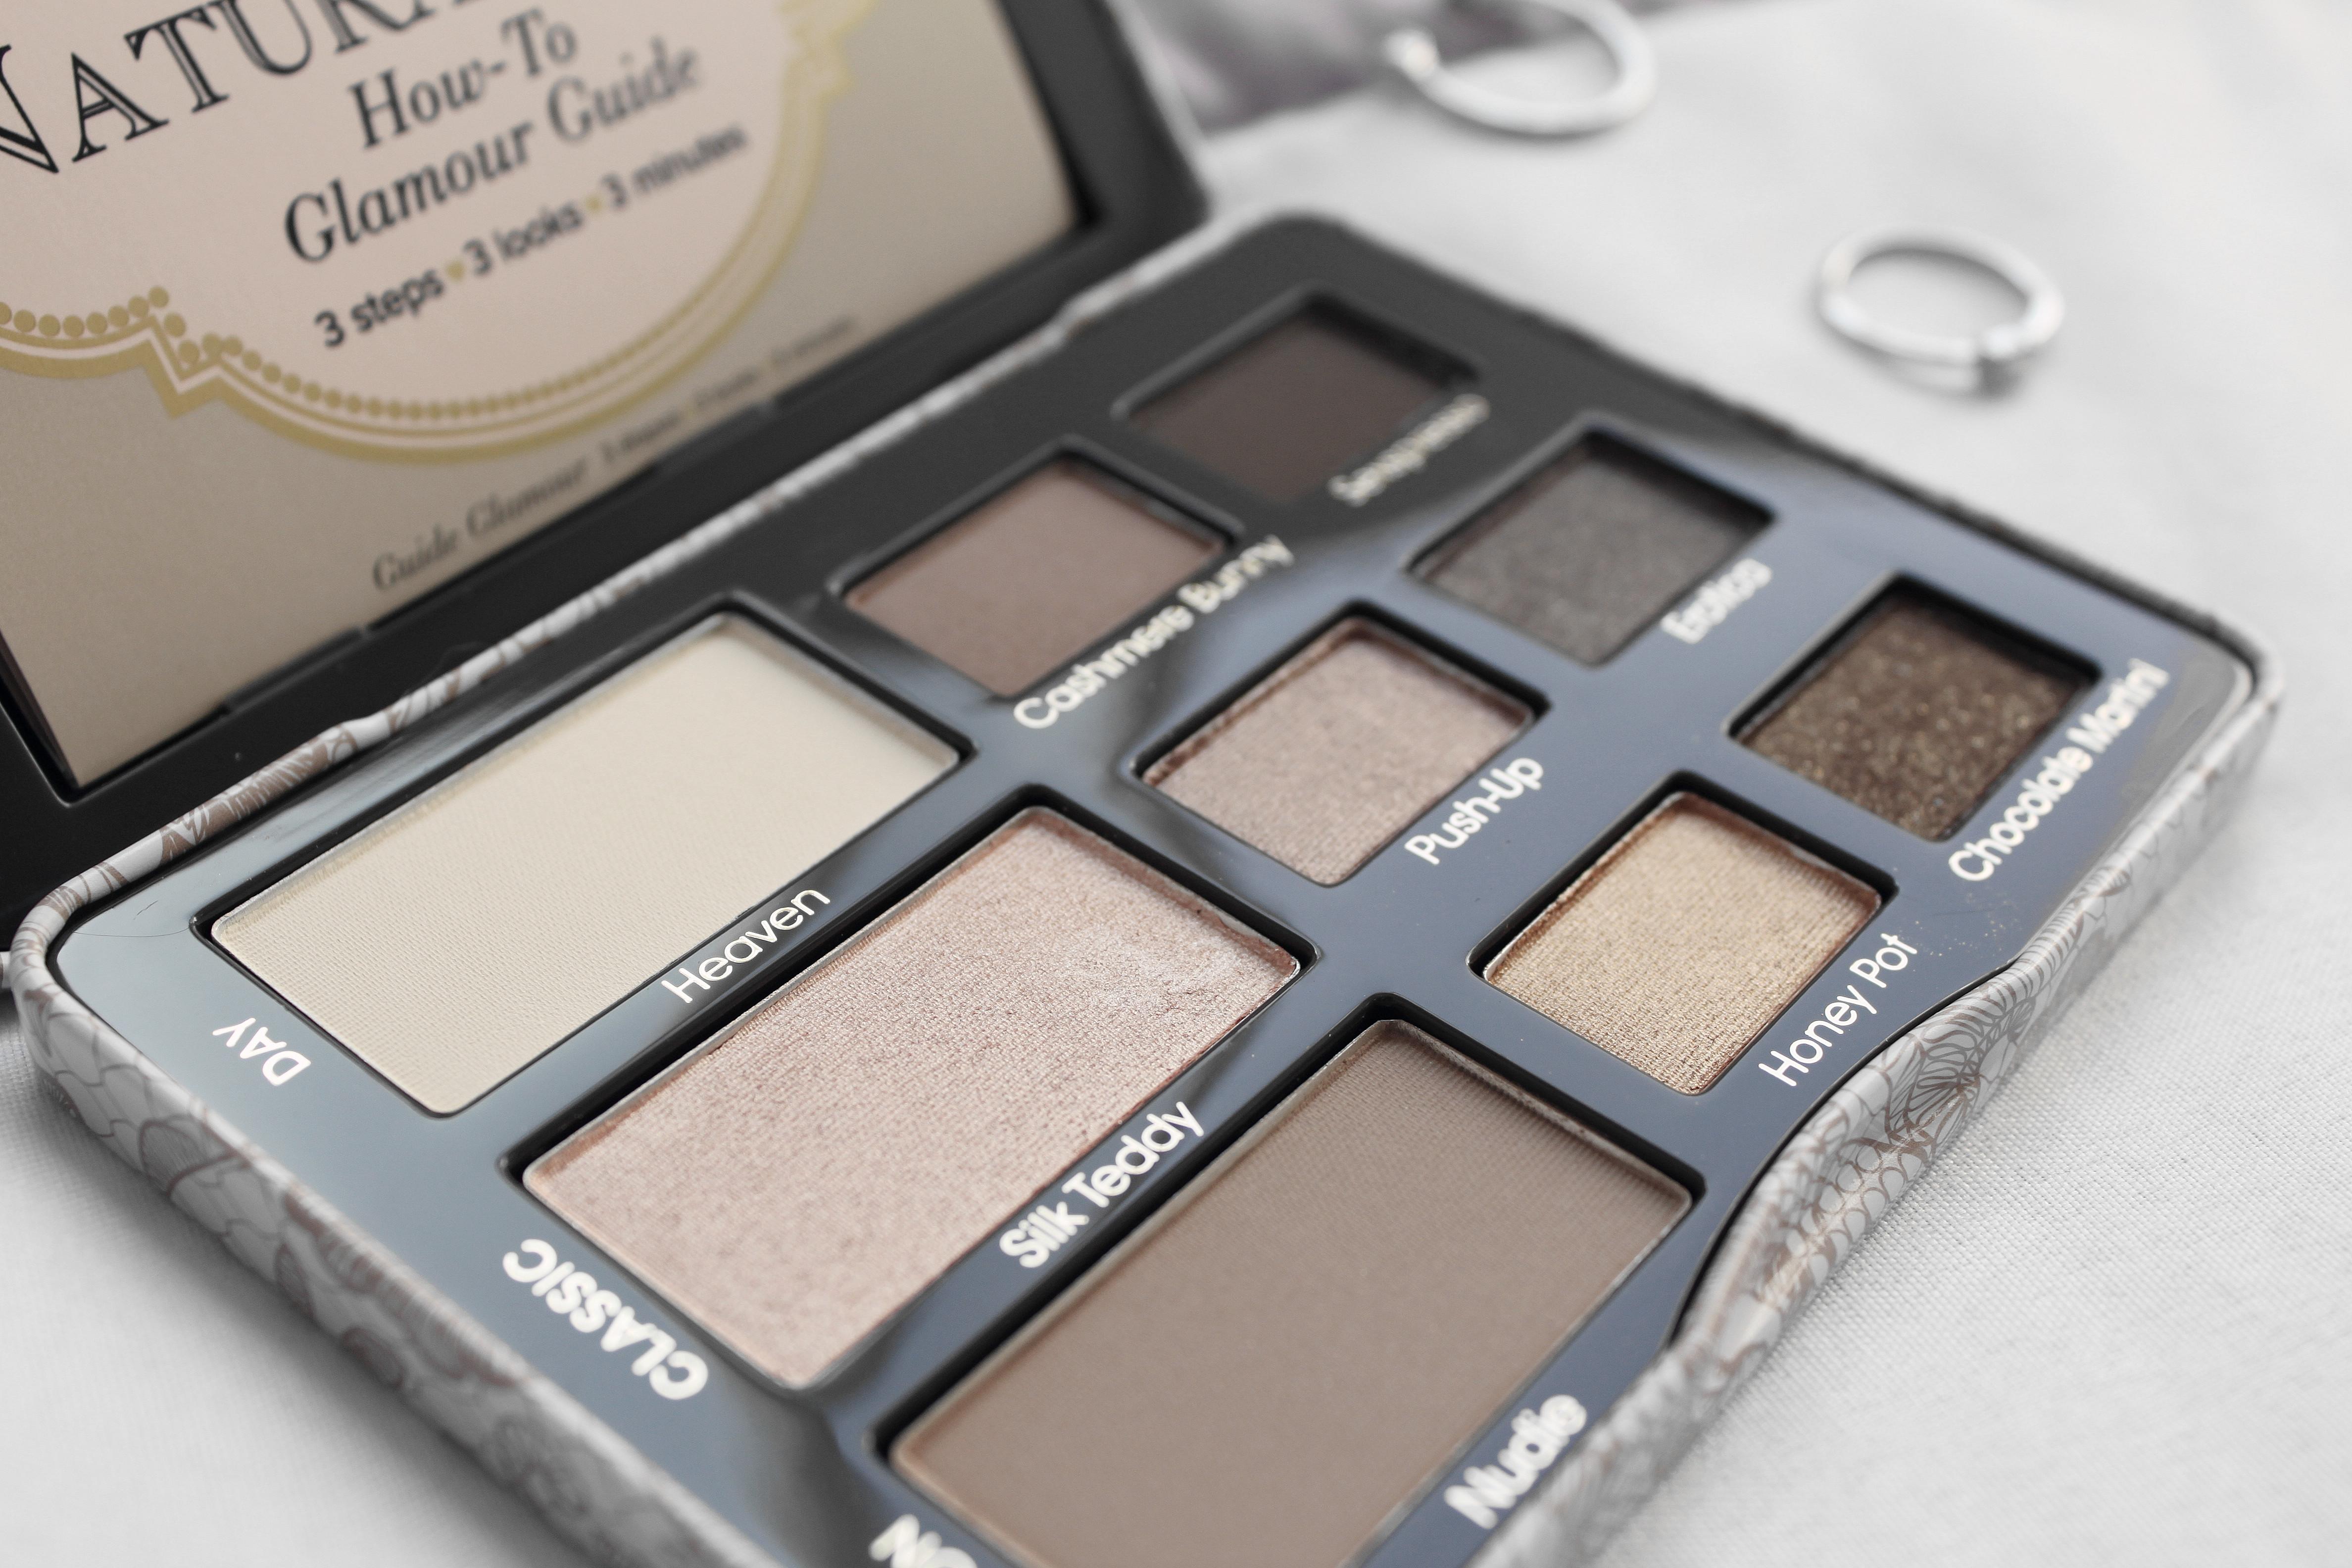 5064-beauty-makeup-skincare-sephora-vibrouge-cosmetics-toofaced-naturaleyes-eyeshadow-eyeshadowpalette-clothestoyouuu-elizabeeetht-flatlay